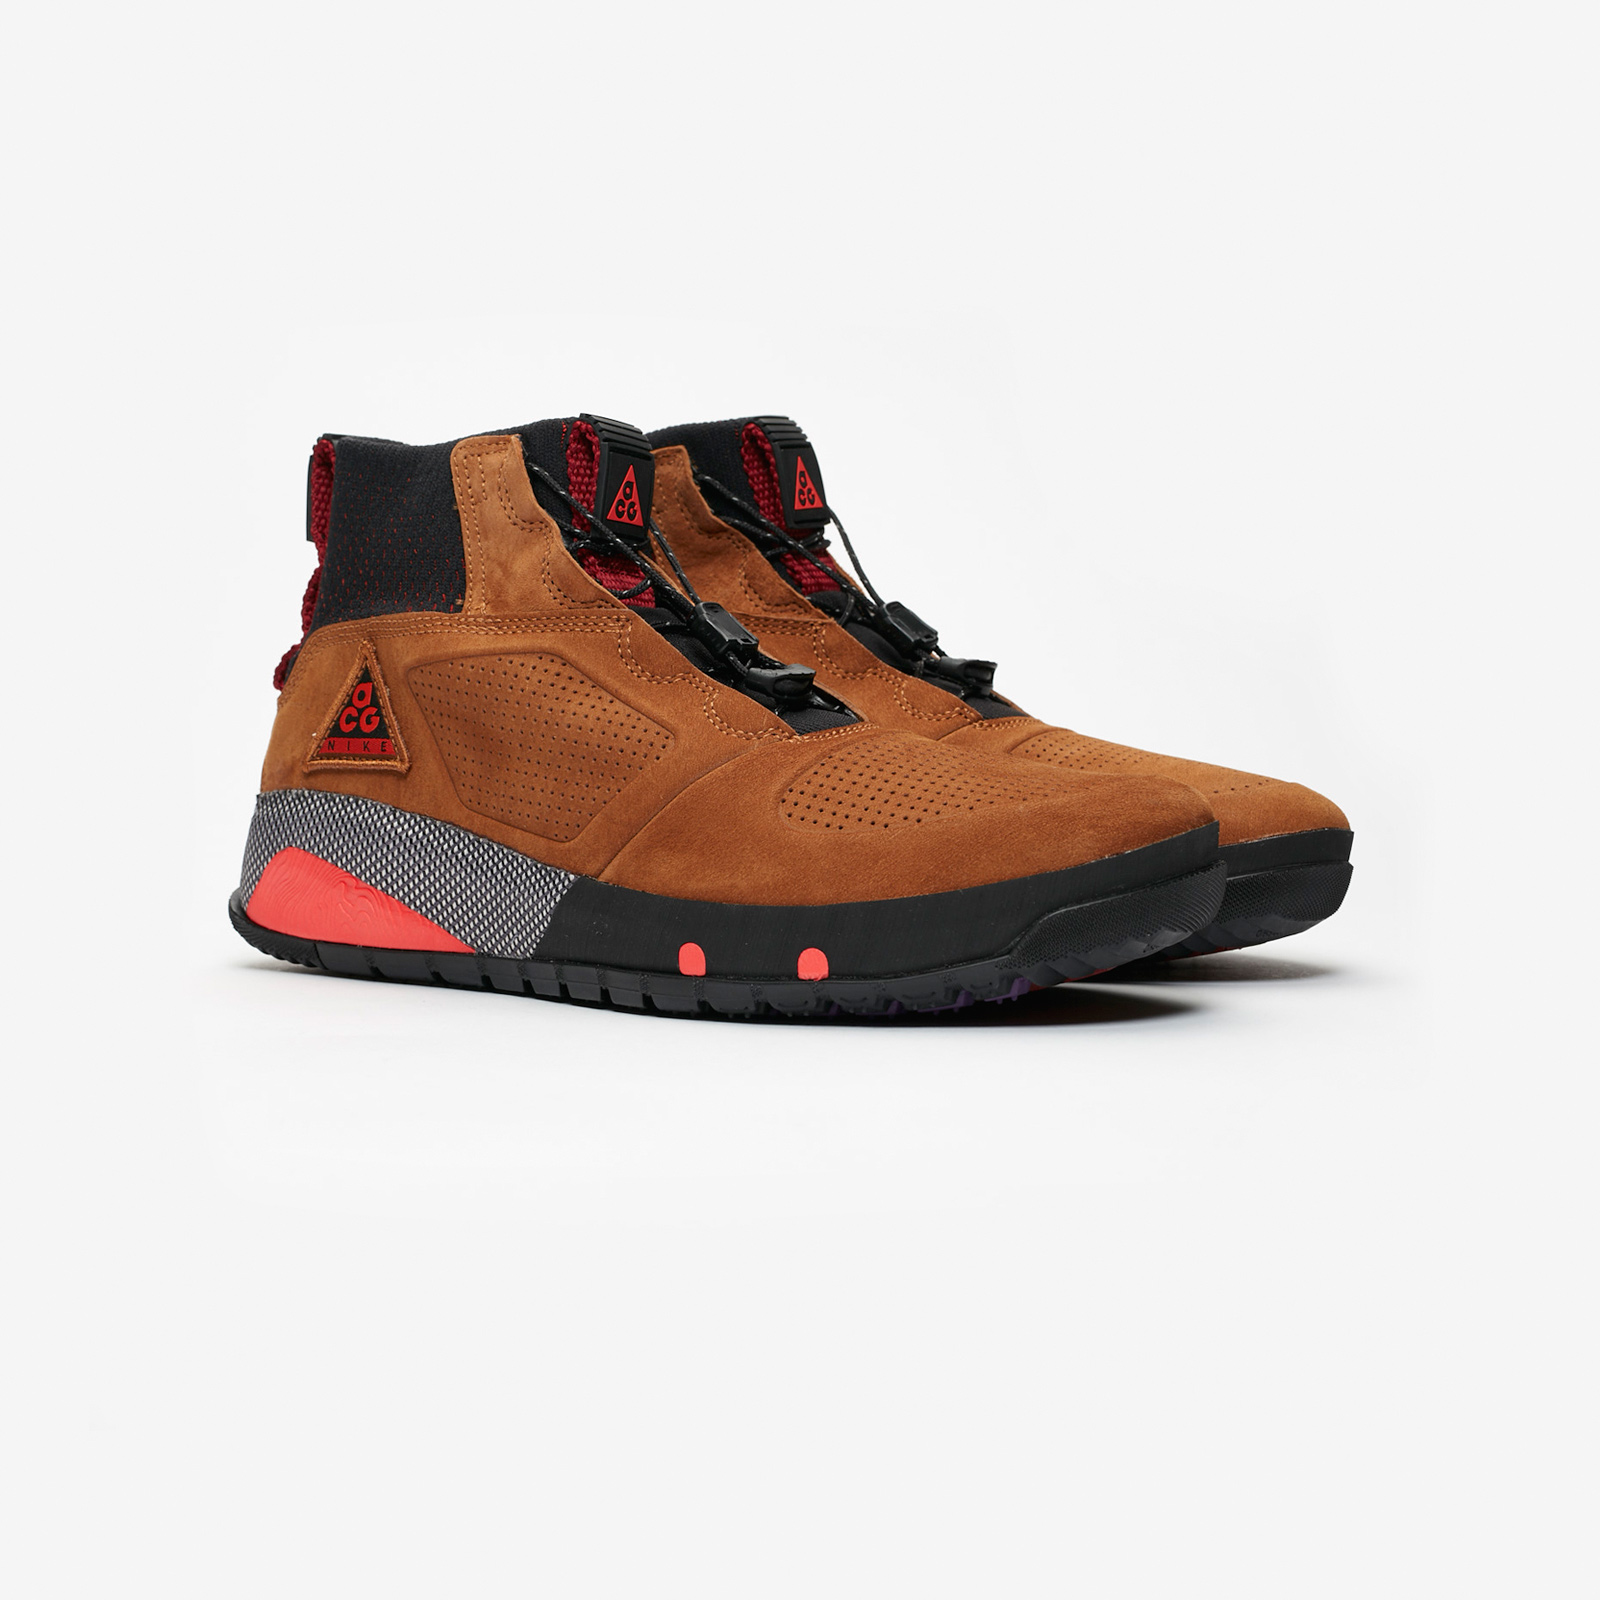 524b9e6bbd11b Nike ACG Ruckel Ridge - Aq9333-226 - Sneakersnstuff